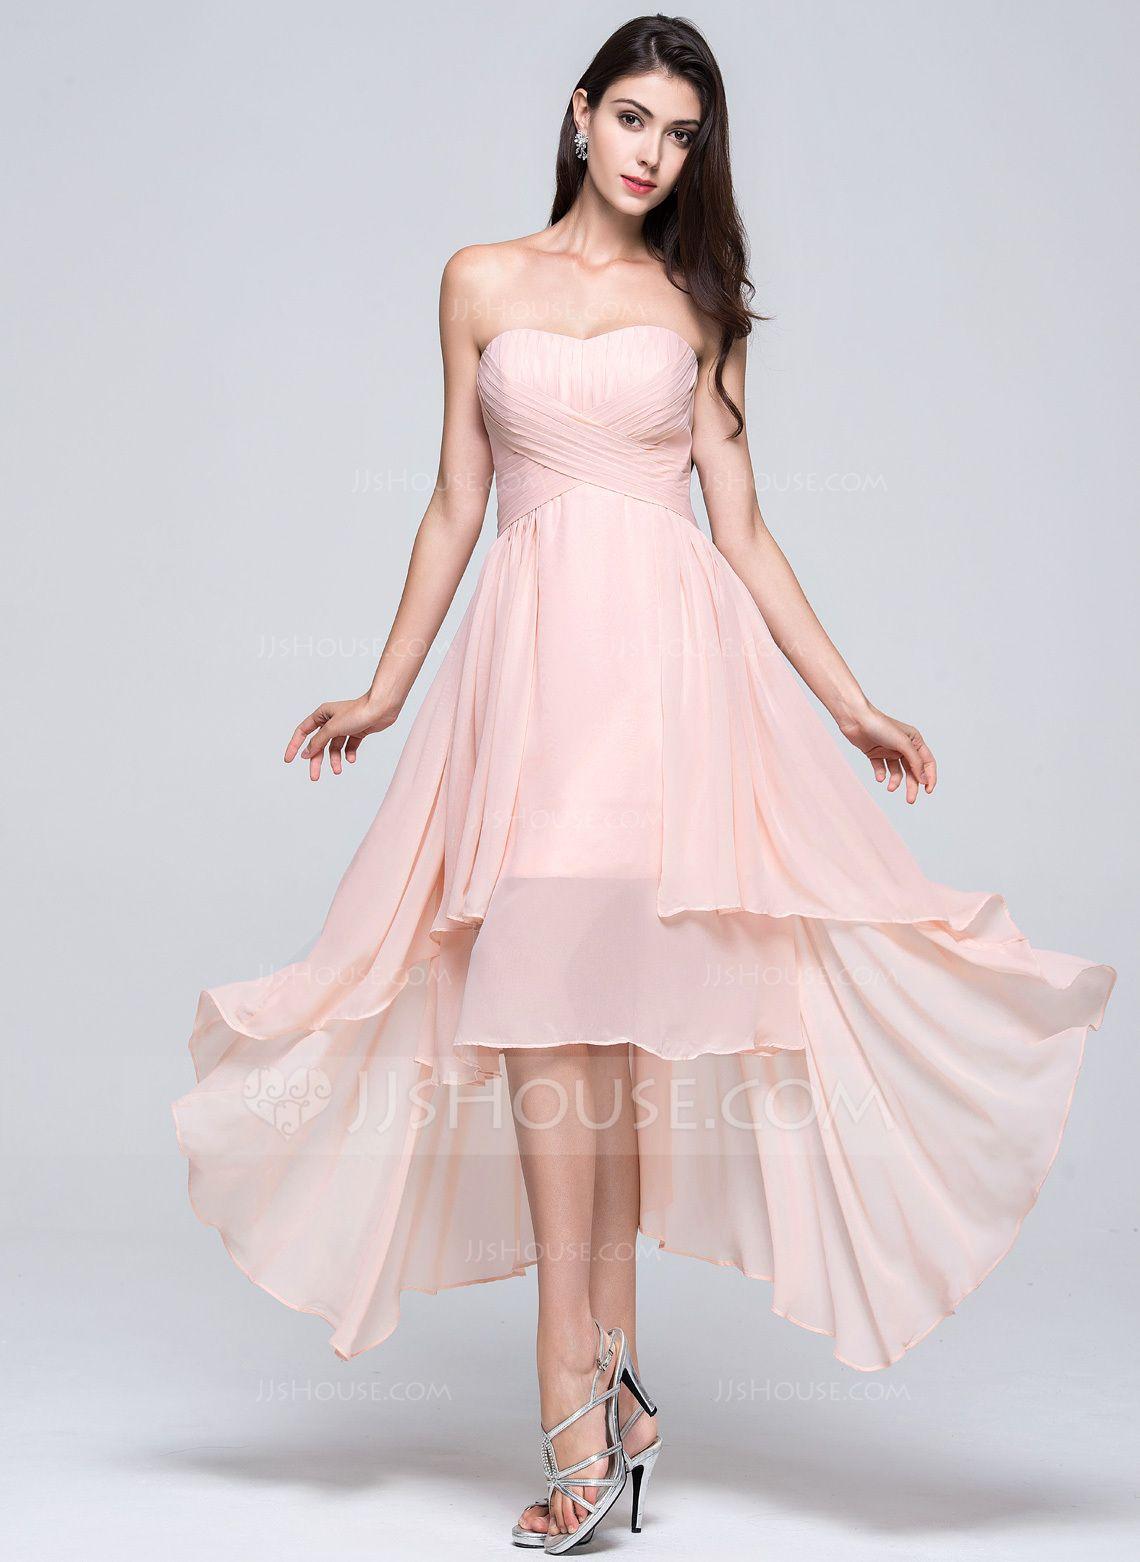 Alineprincess sweetheart asymmetrical chiffon bridesmaid dress